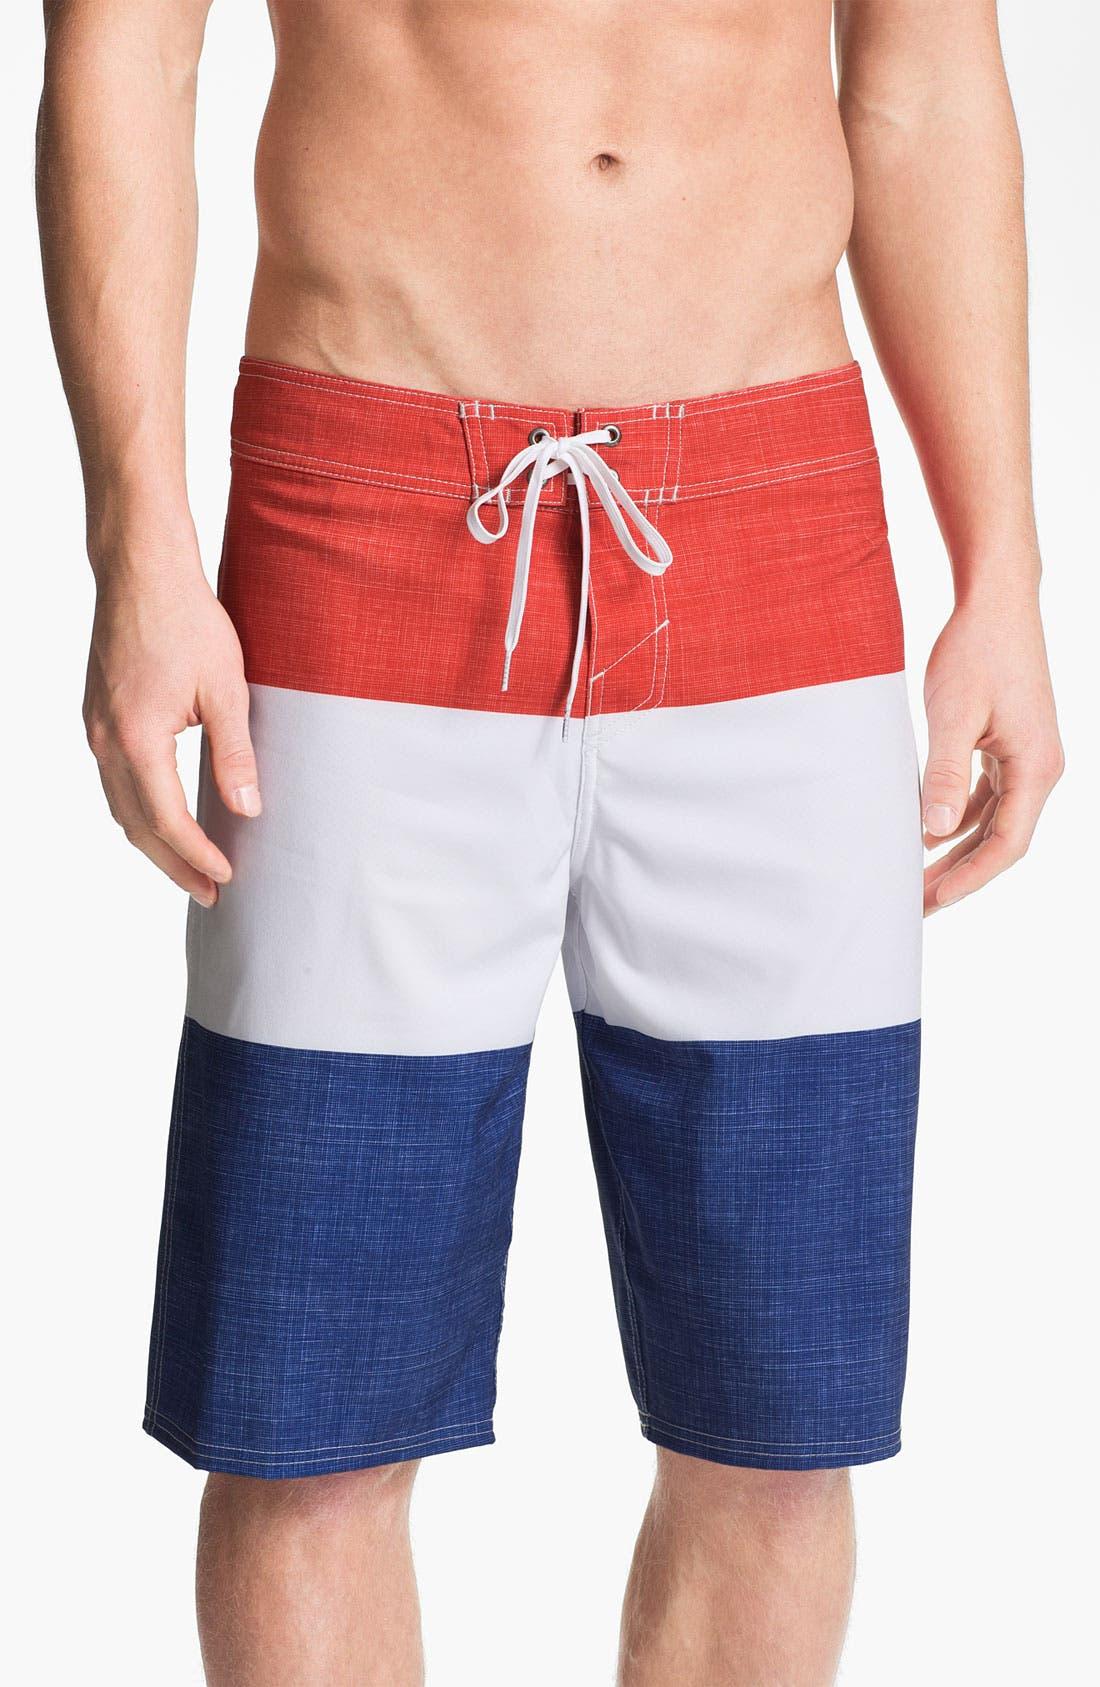 Alternate Image 1 Selected - O'Neill 'PBR Stripe' Board Shorts